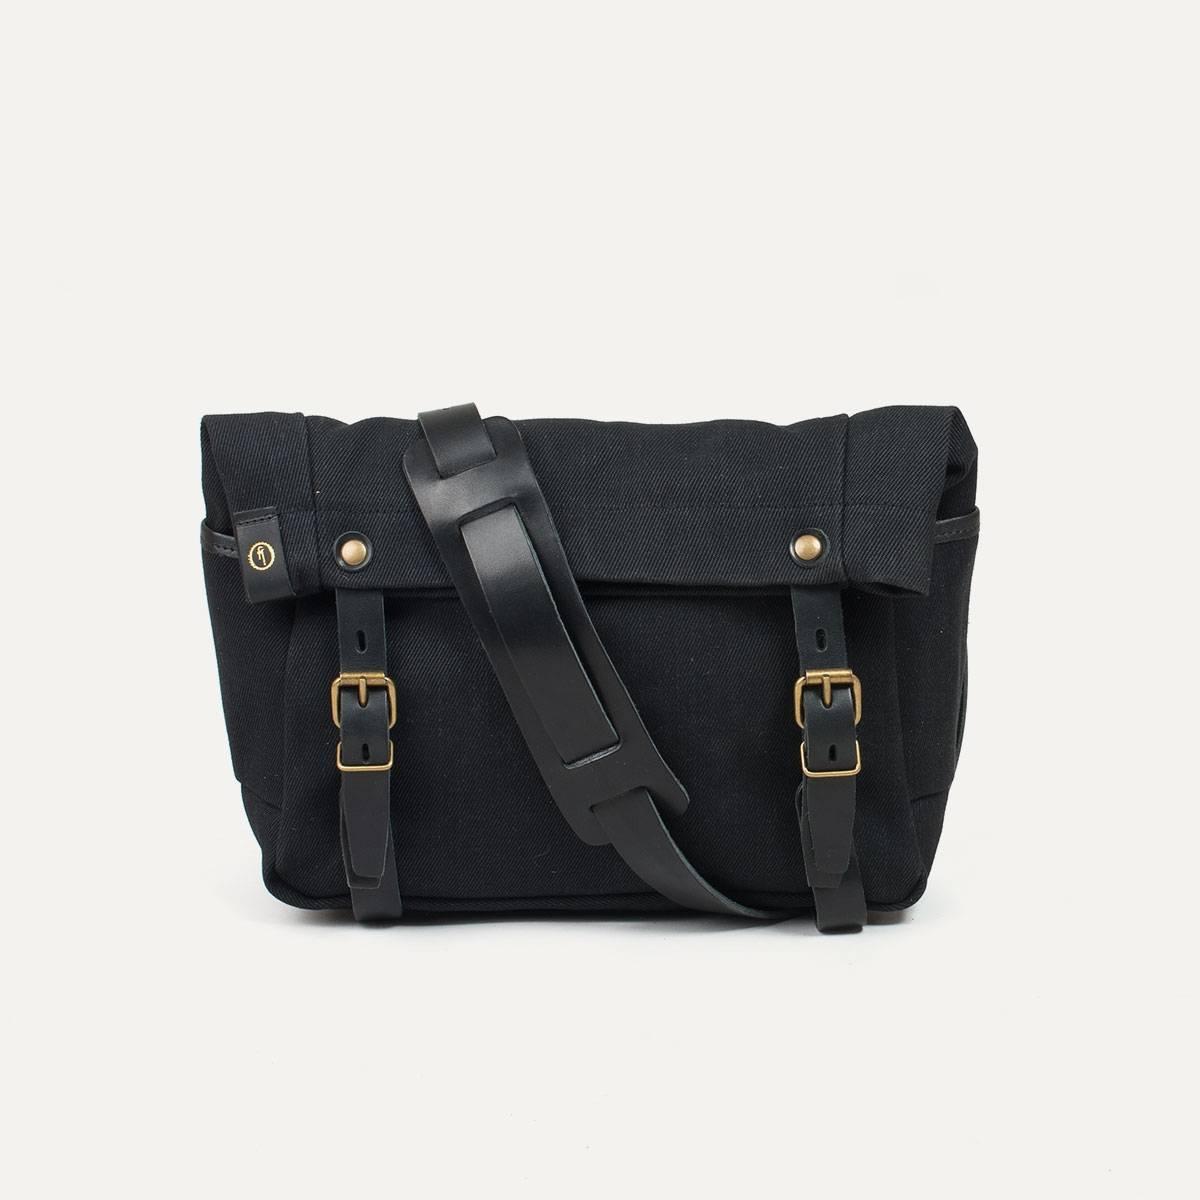 Gibus tool bag - Black (image n°1)